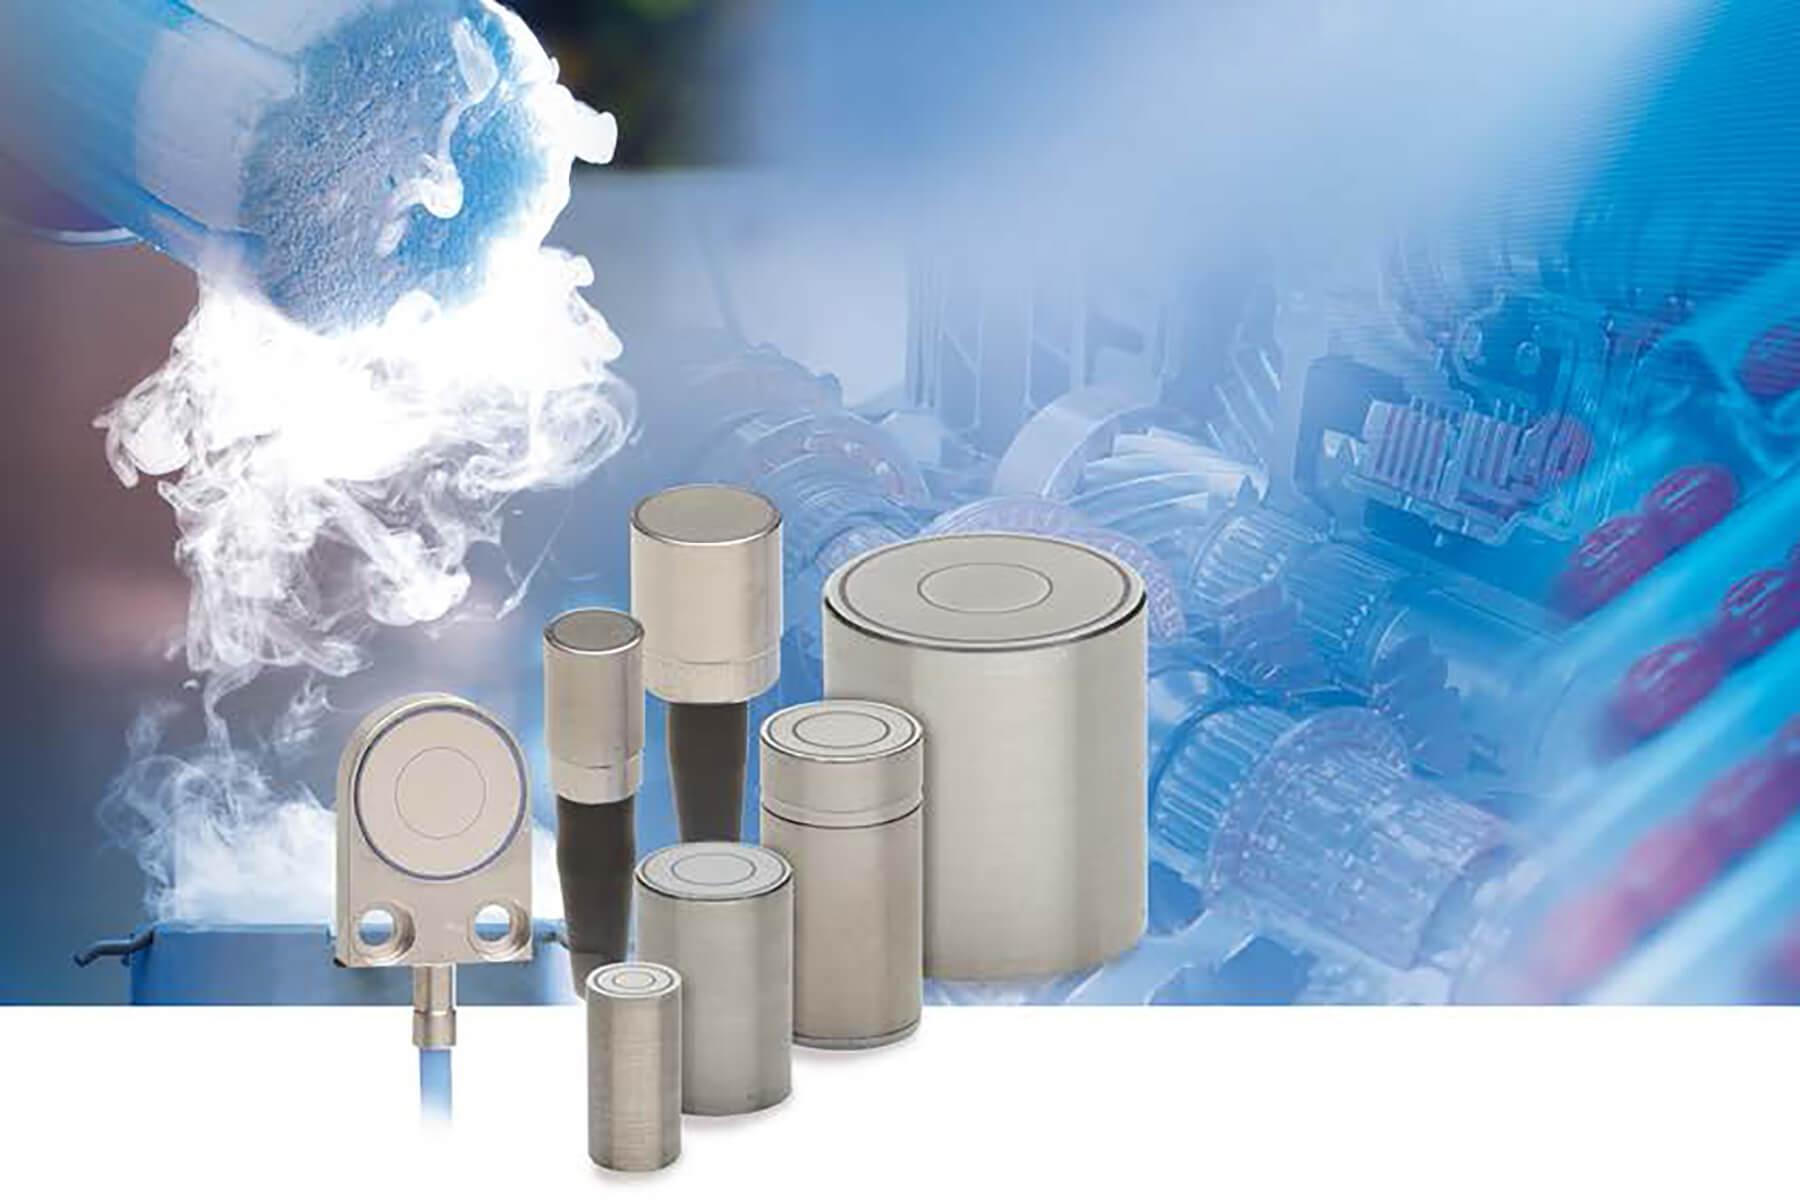 proximity sensor, jual proximity sensor, sensor perpindahan, proximity sensor kapasitif